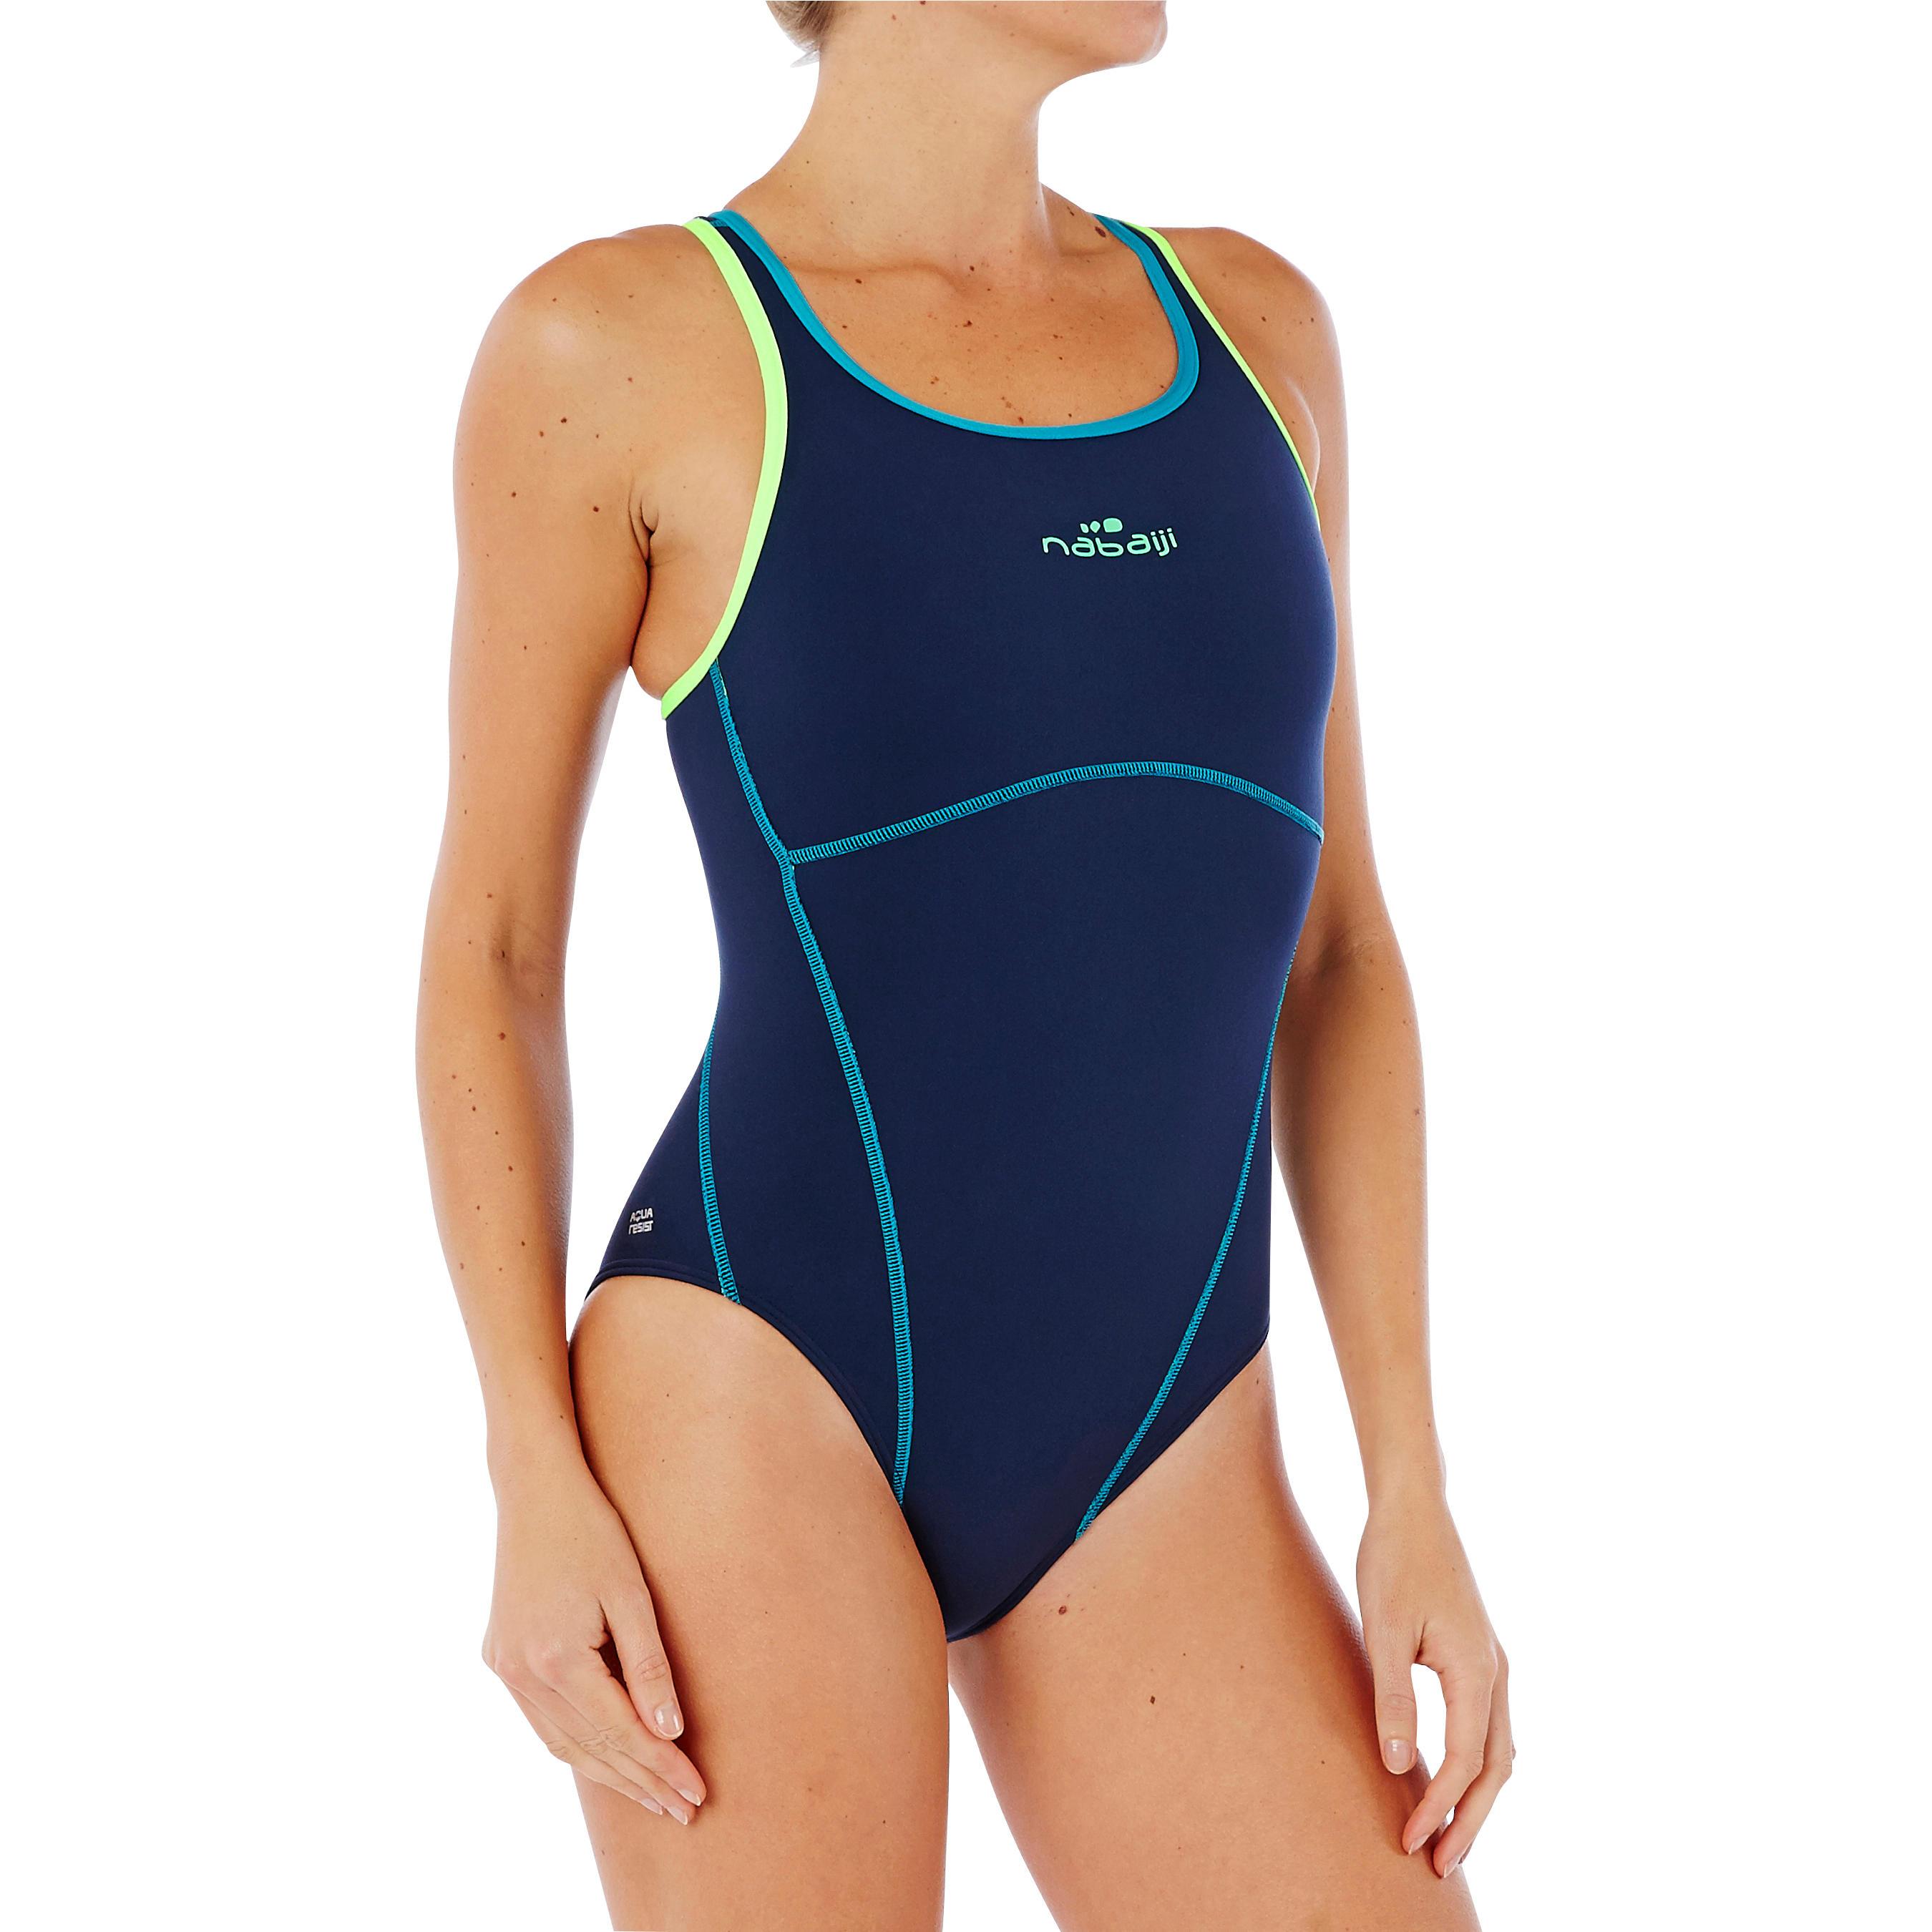 Kamiye Women's Chlorine-Resistant One-Piece Swimsuit - Navy Blue